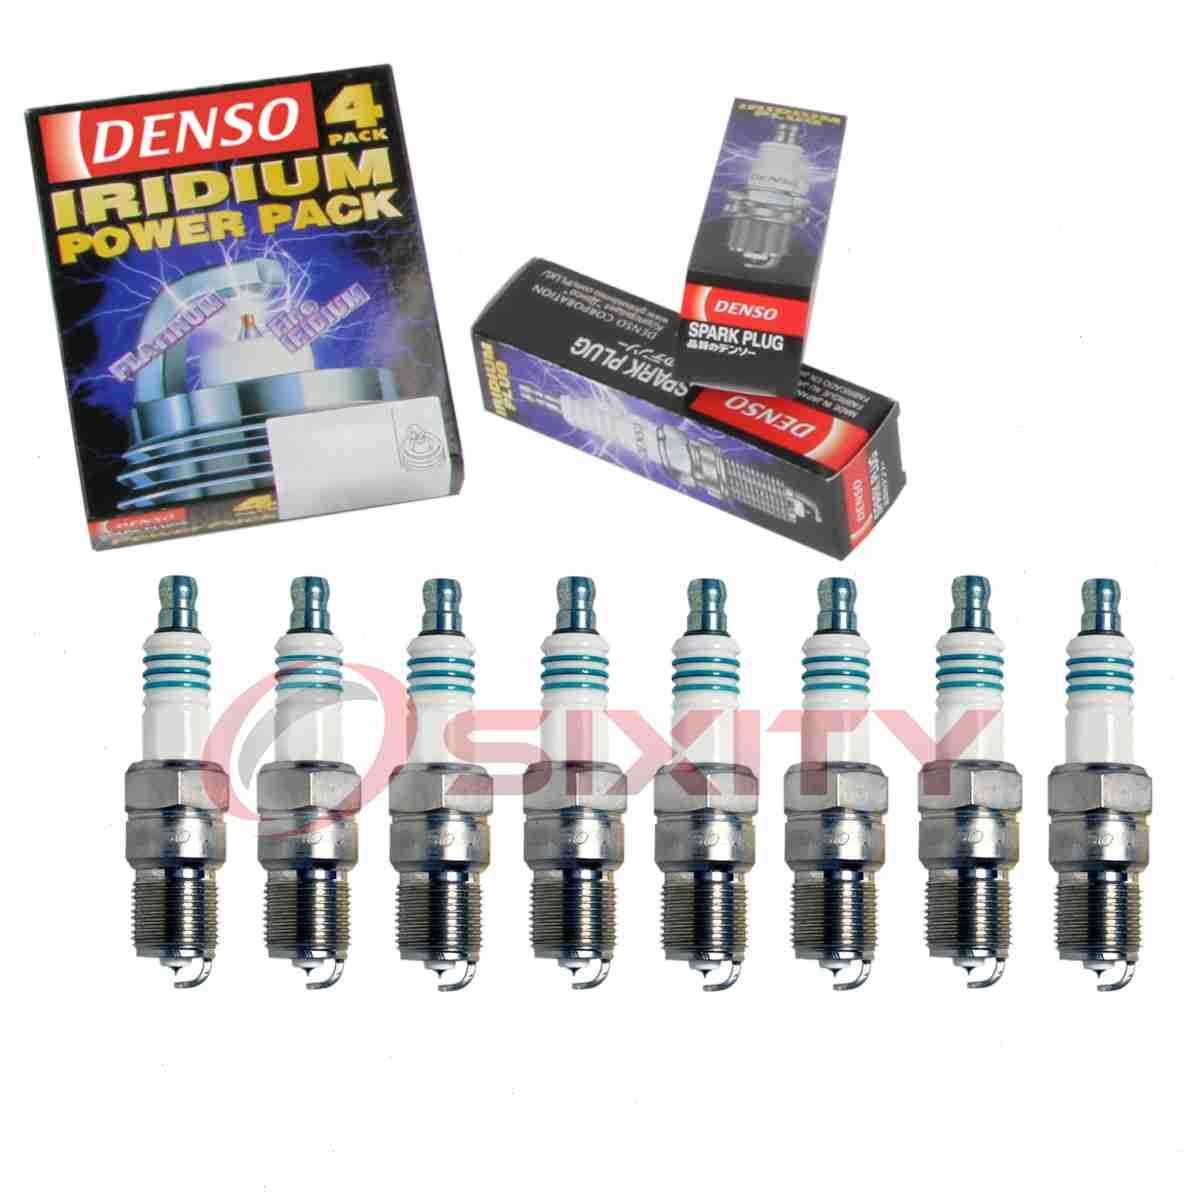 8 pc Denso Platinum TT Spark Plugs for Ford Ranger 2.3L 2.5L L4 1994-2001 iy